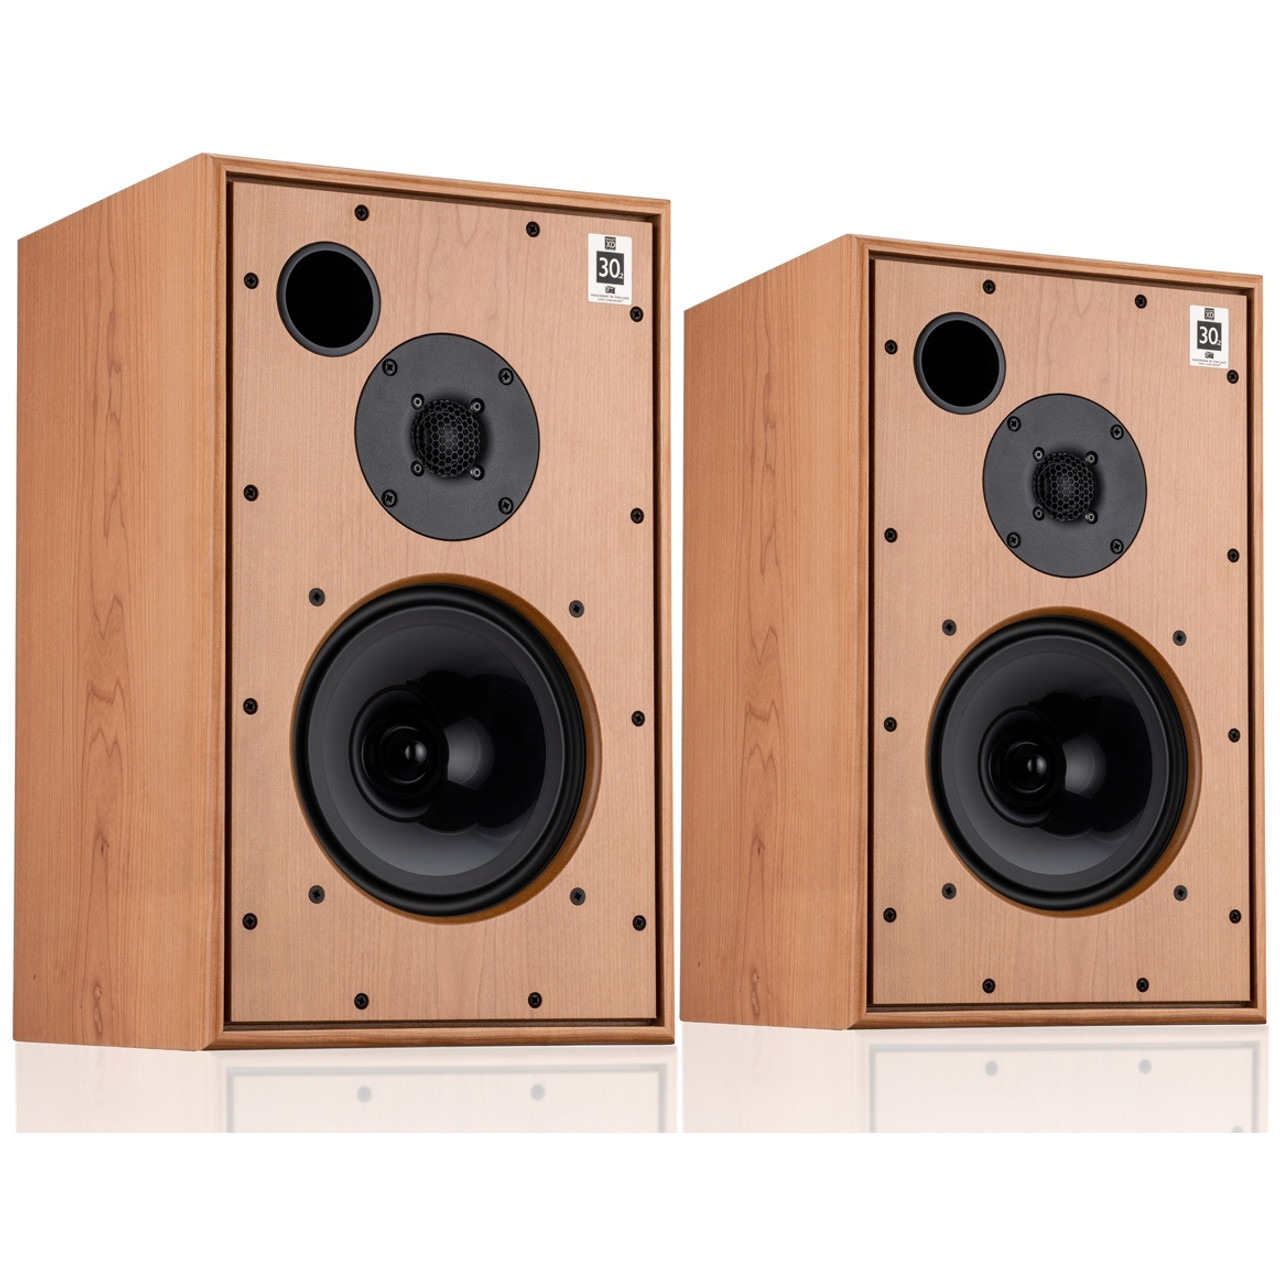 Harbeth Monitor 30.2 XD speakers